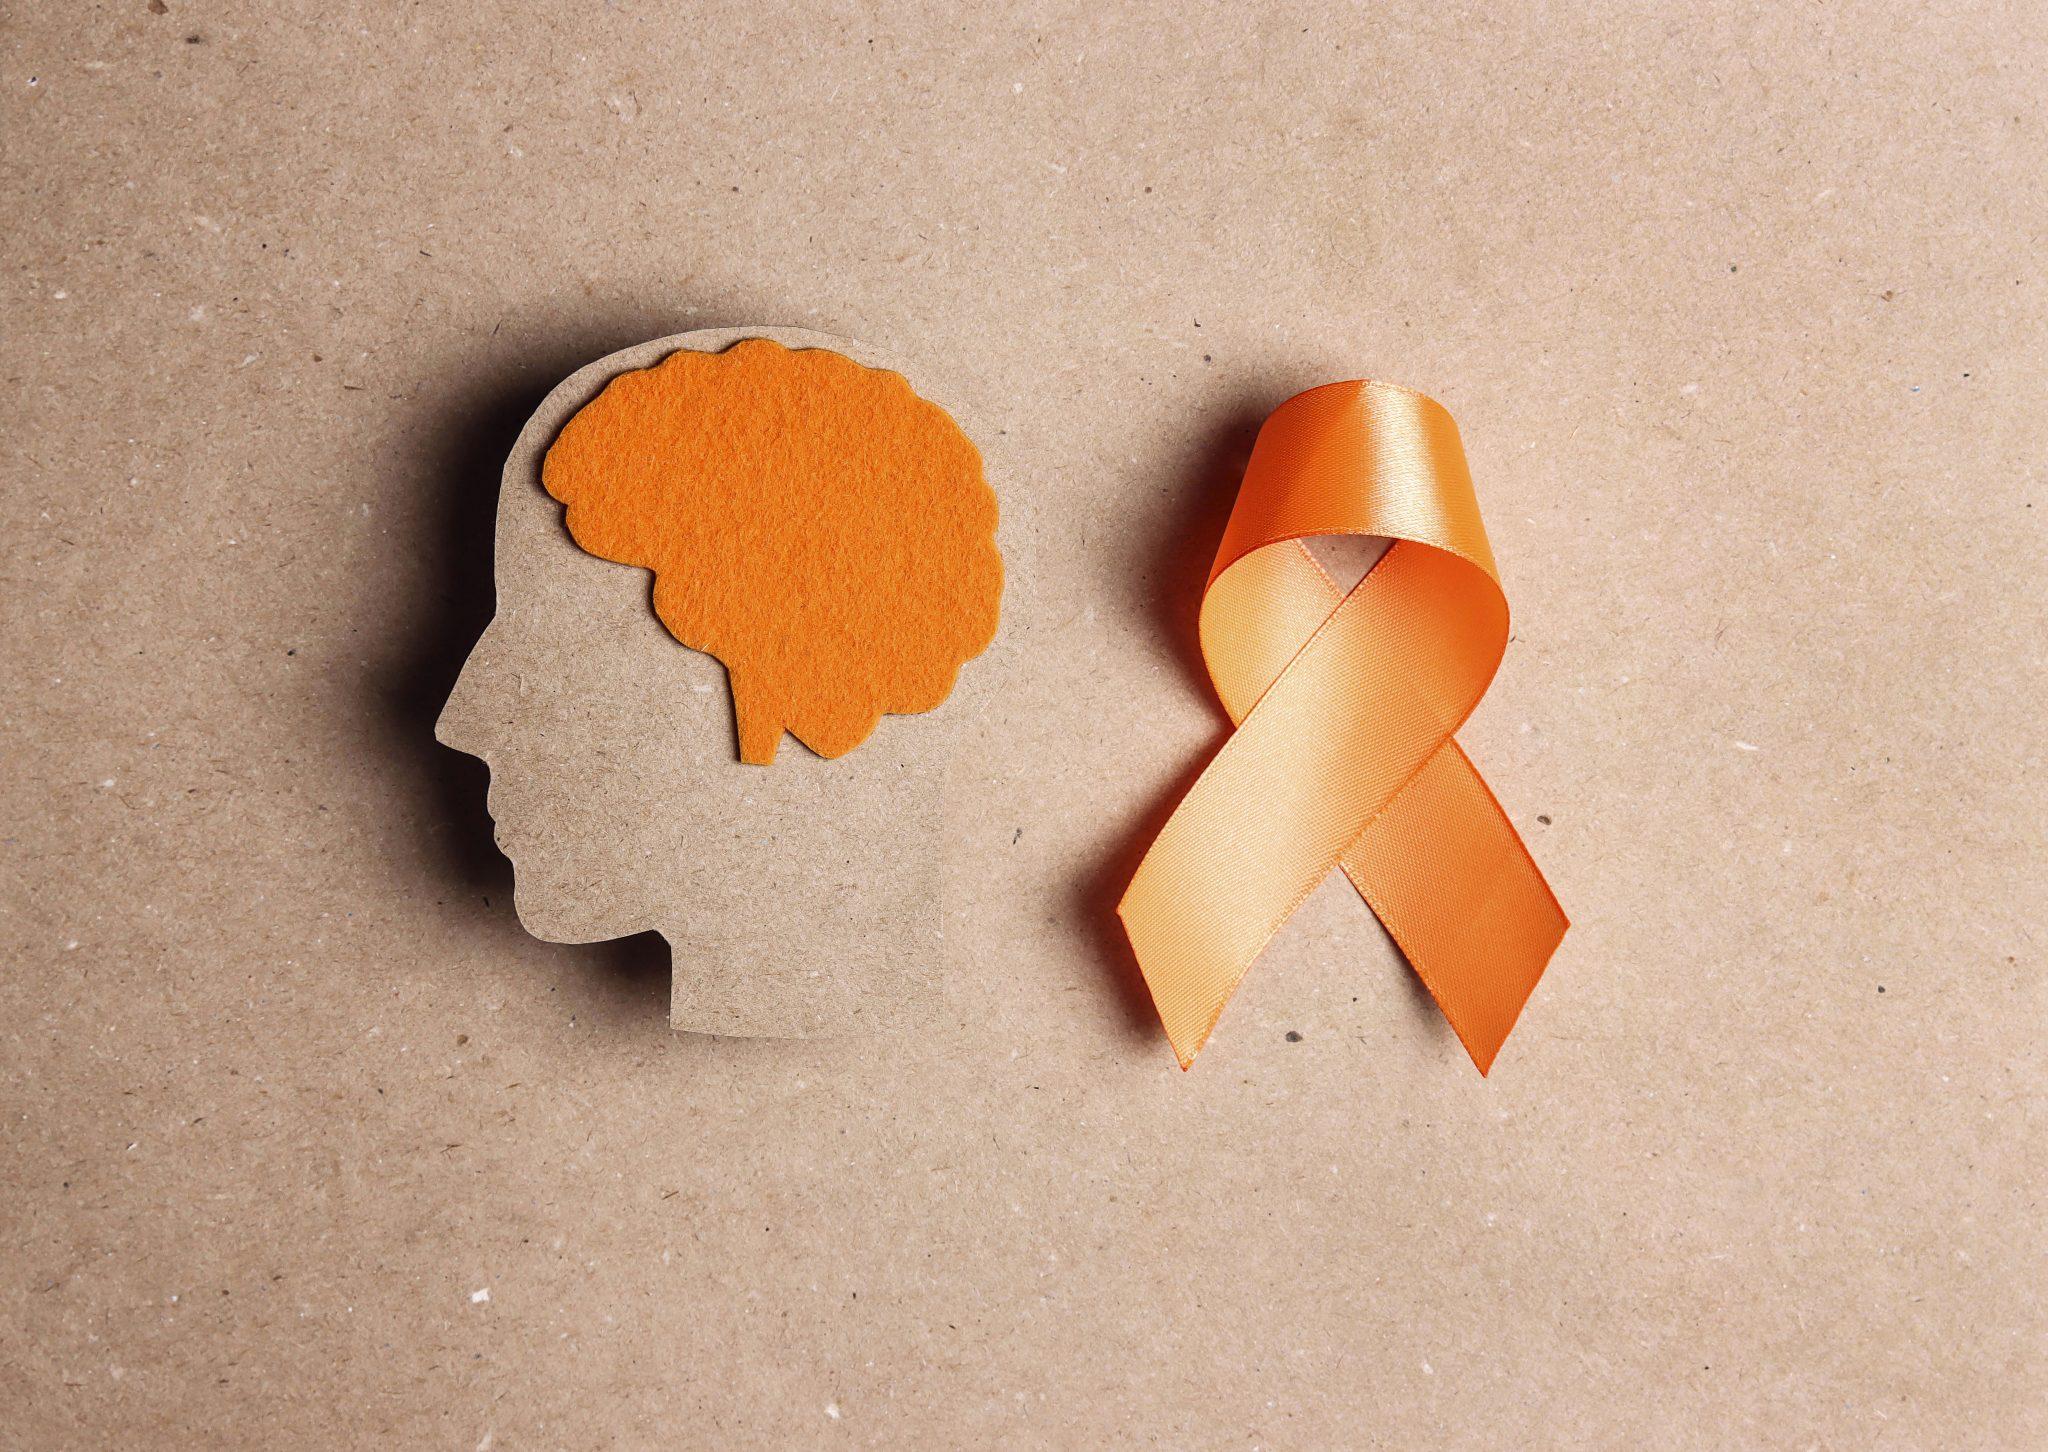 Merck continua campanha sobre Esclerose Múltipla